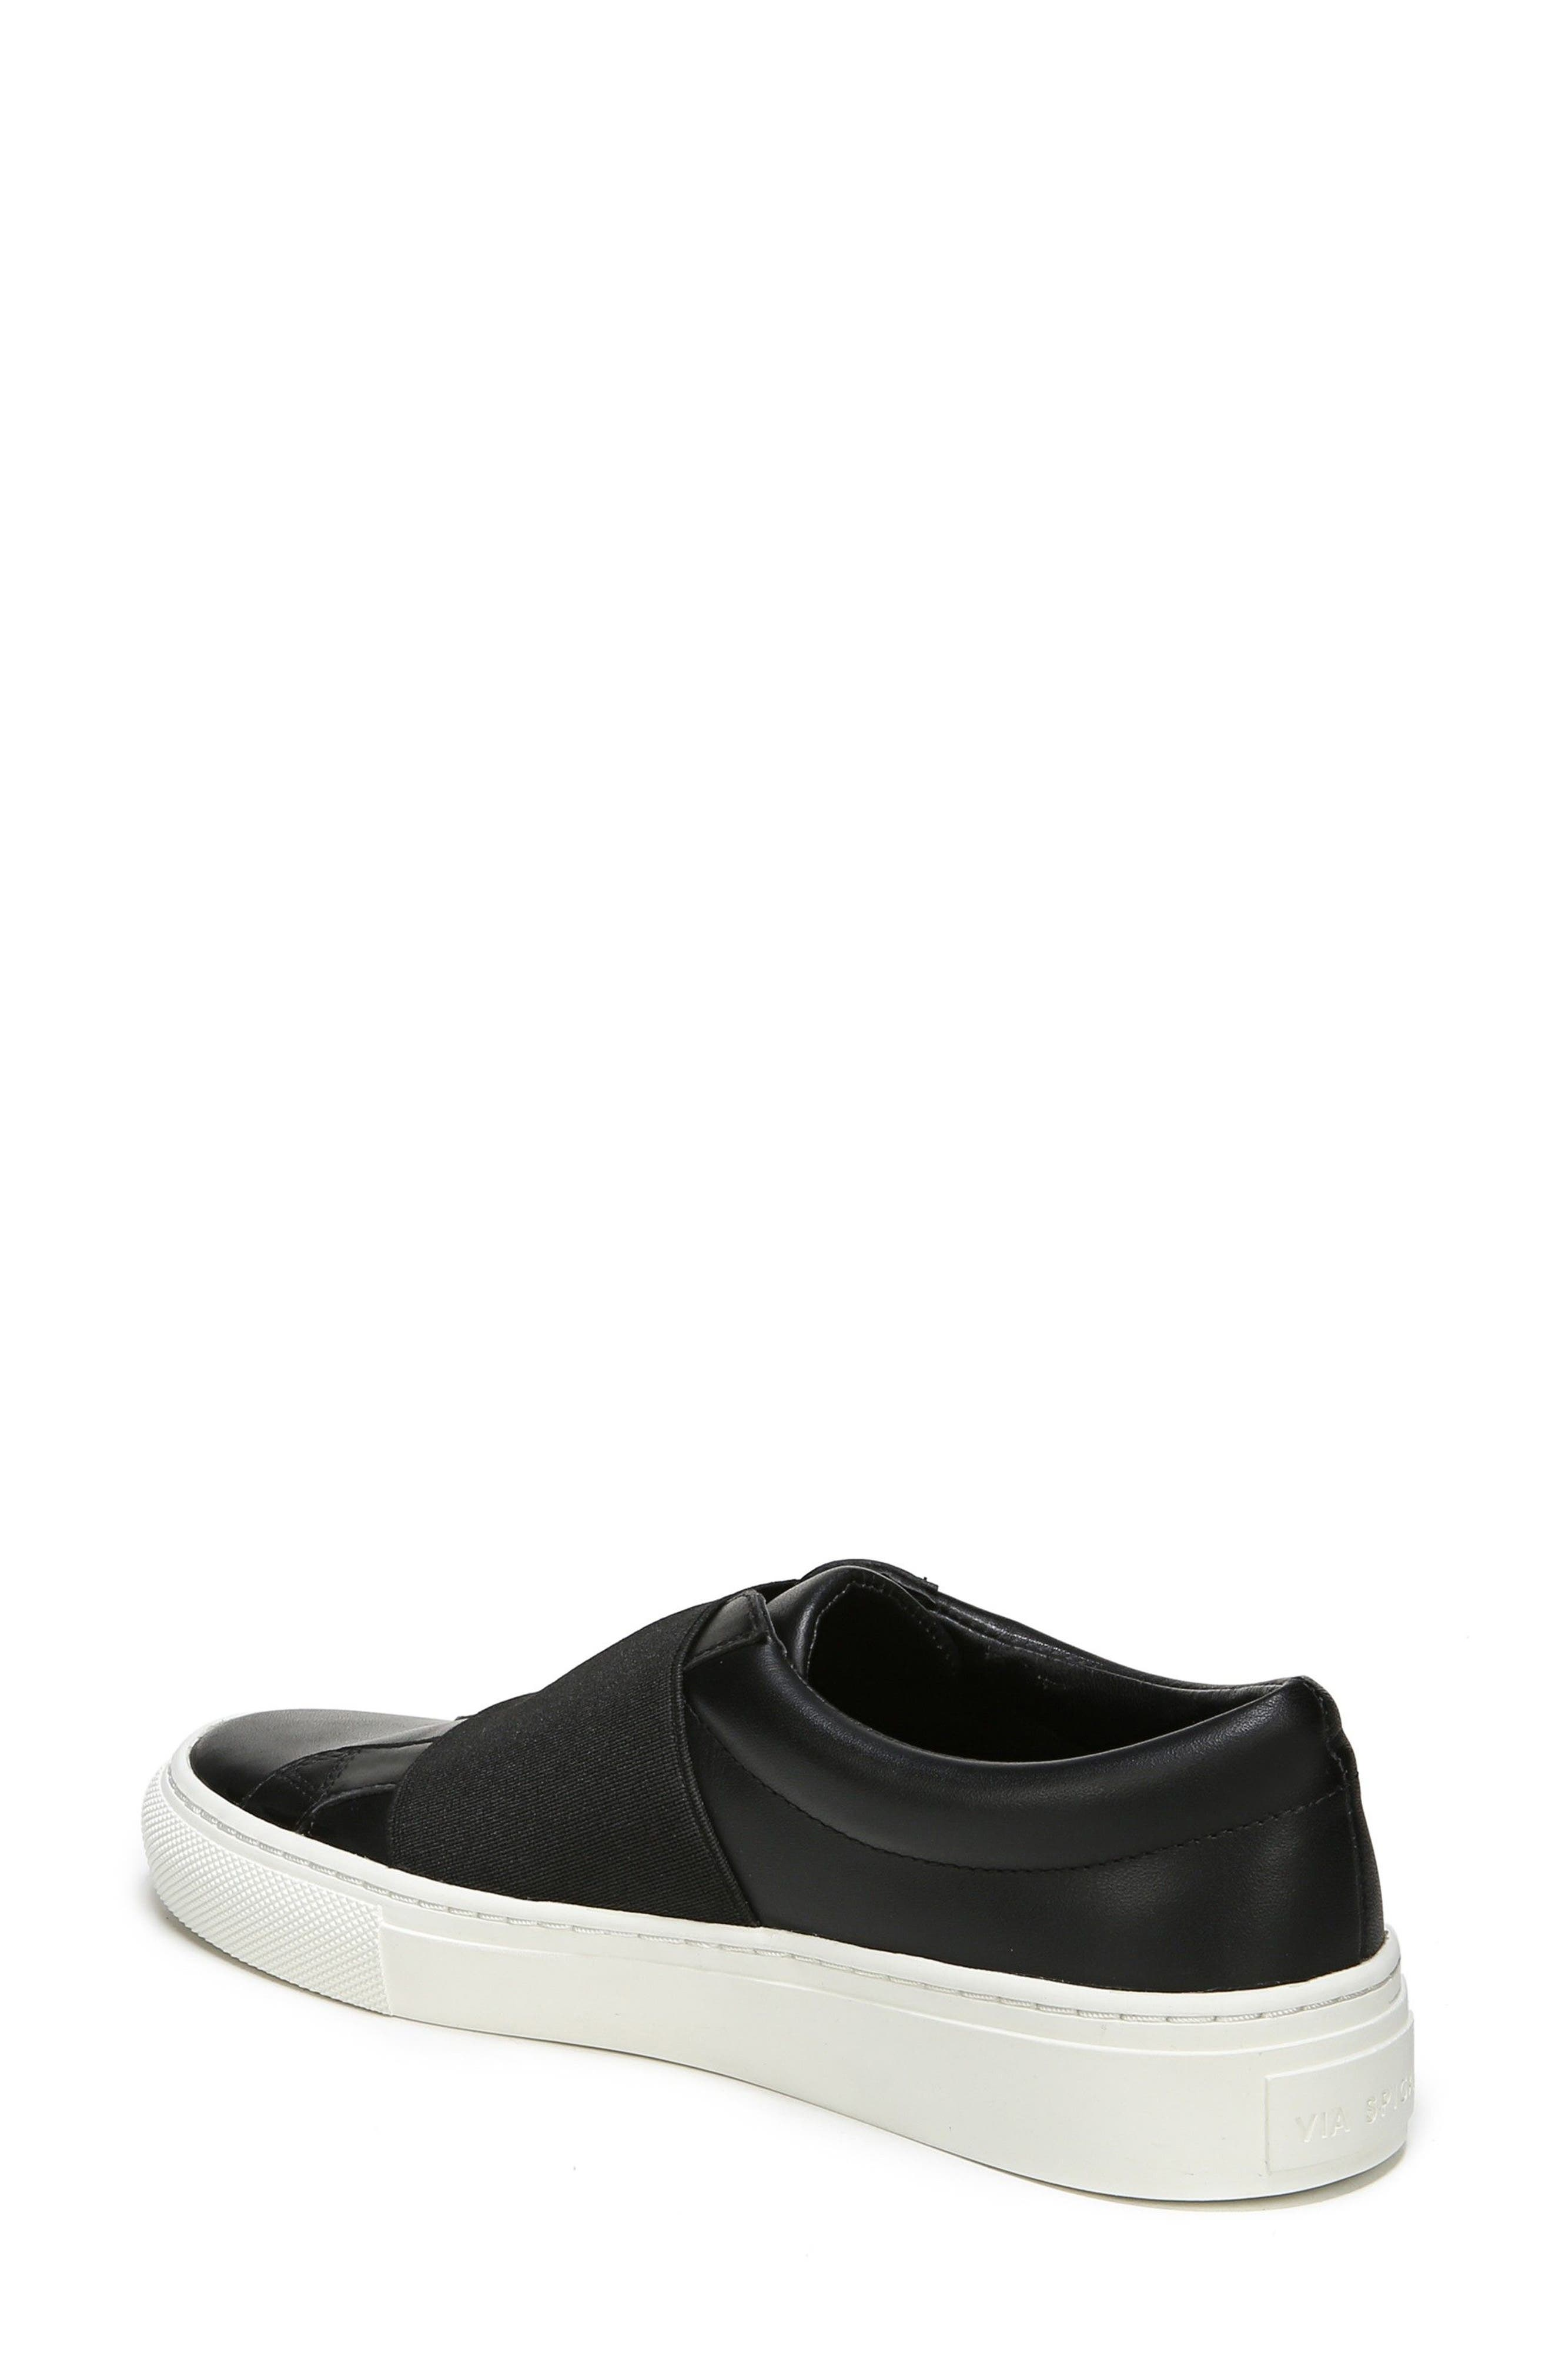 Saran Slip-On Sneaker,                             Alternate thumbnail 2, color,                             Black/ Black Leather